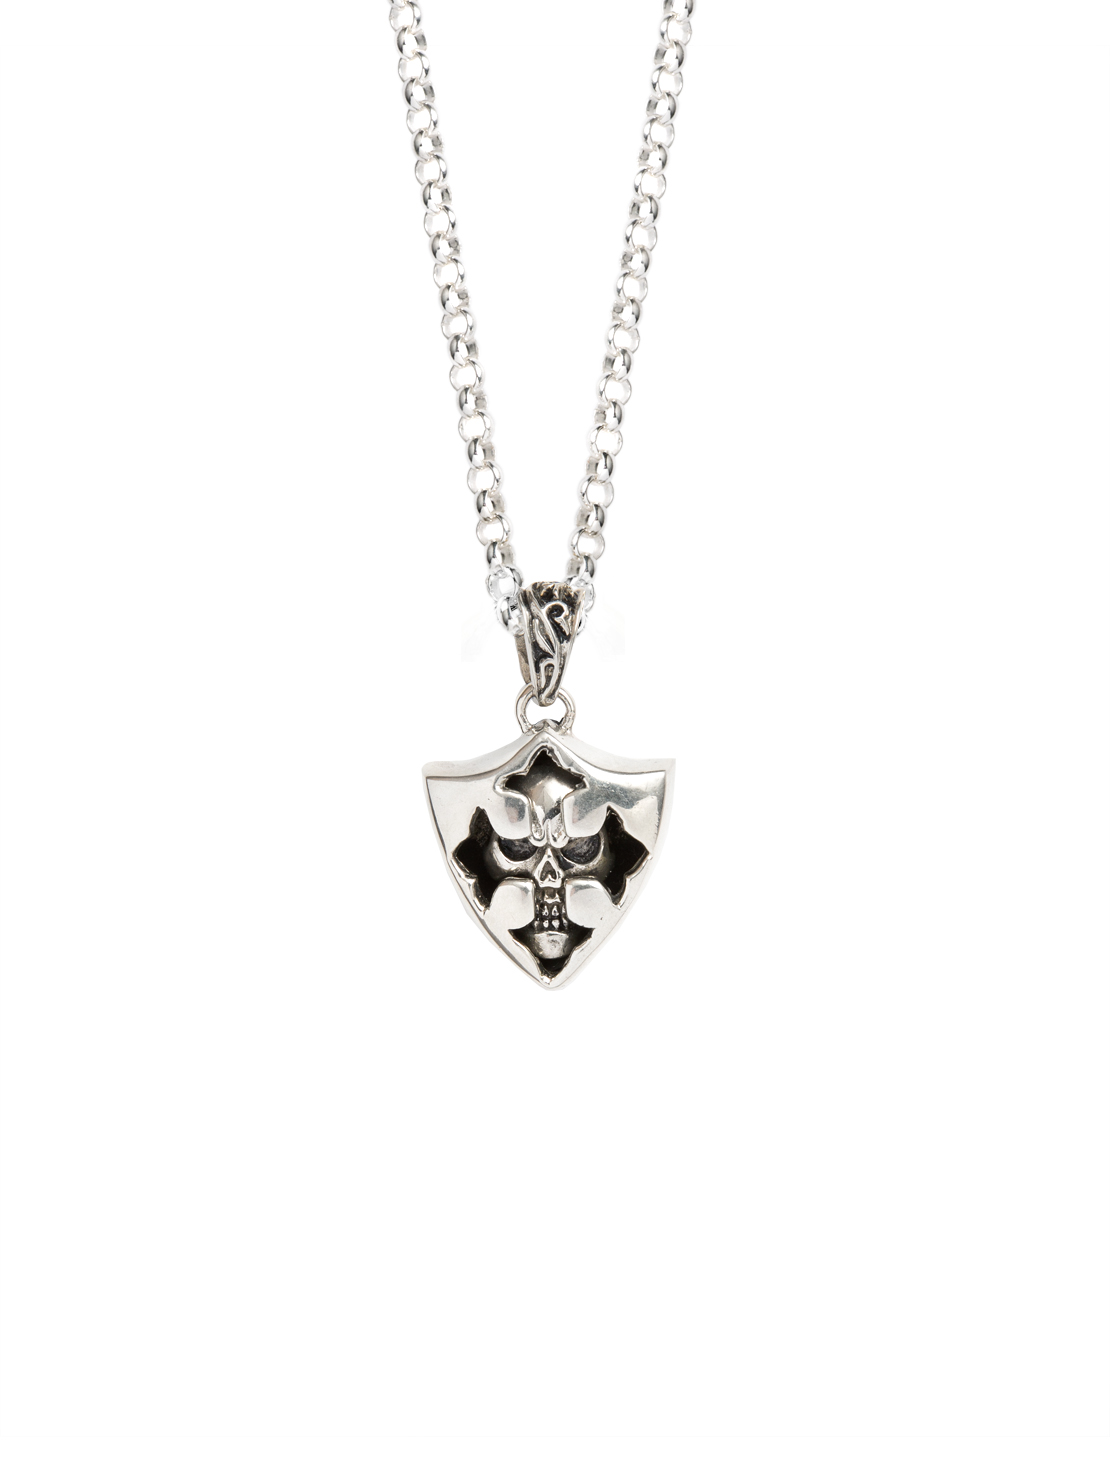 68540b7b233 Silver Skull Shield Necklace - Tilly Sveaas Jewellery